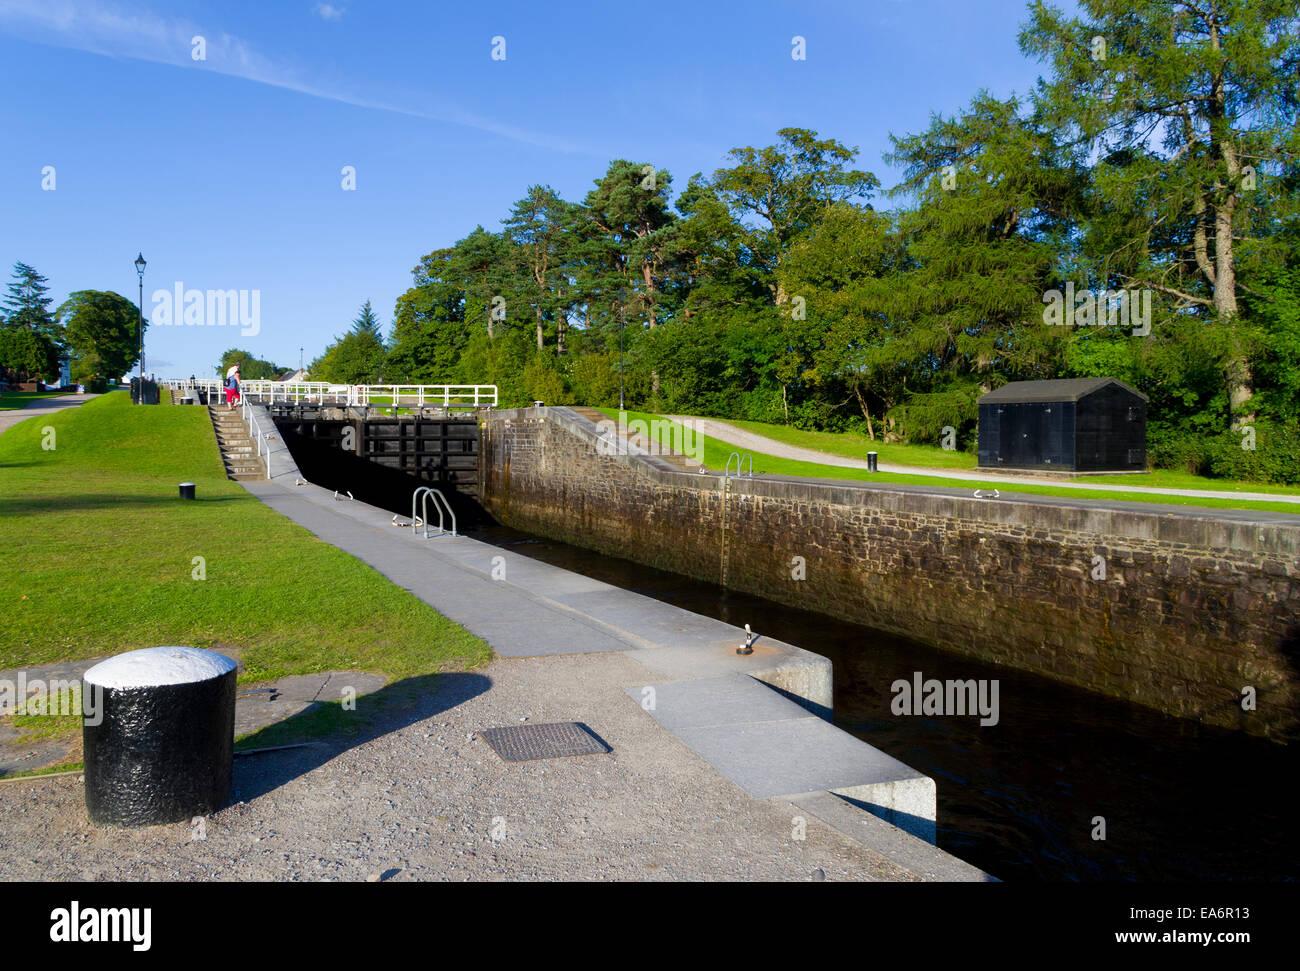 Neptune's Staircase, Caledonian Canal, Banavie, Lochaber, Highland, Scotland, UK - Stock Image